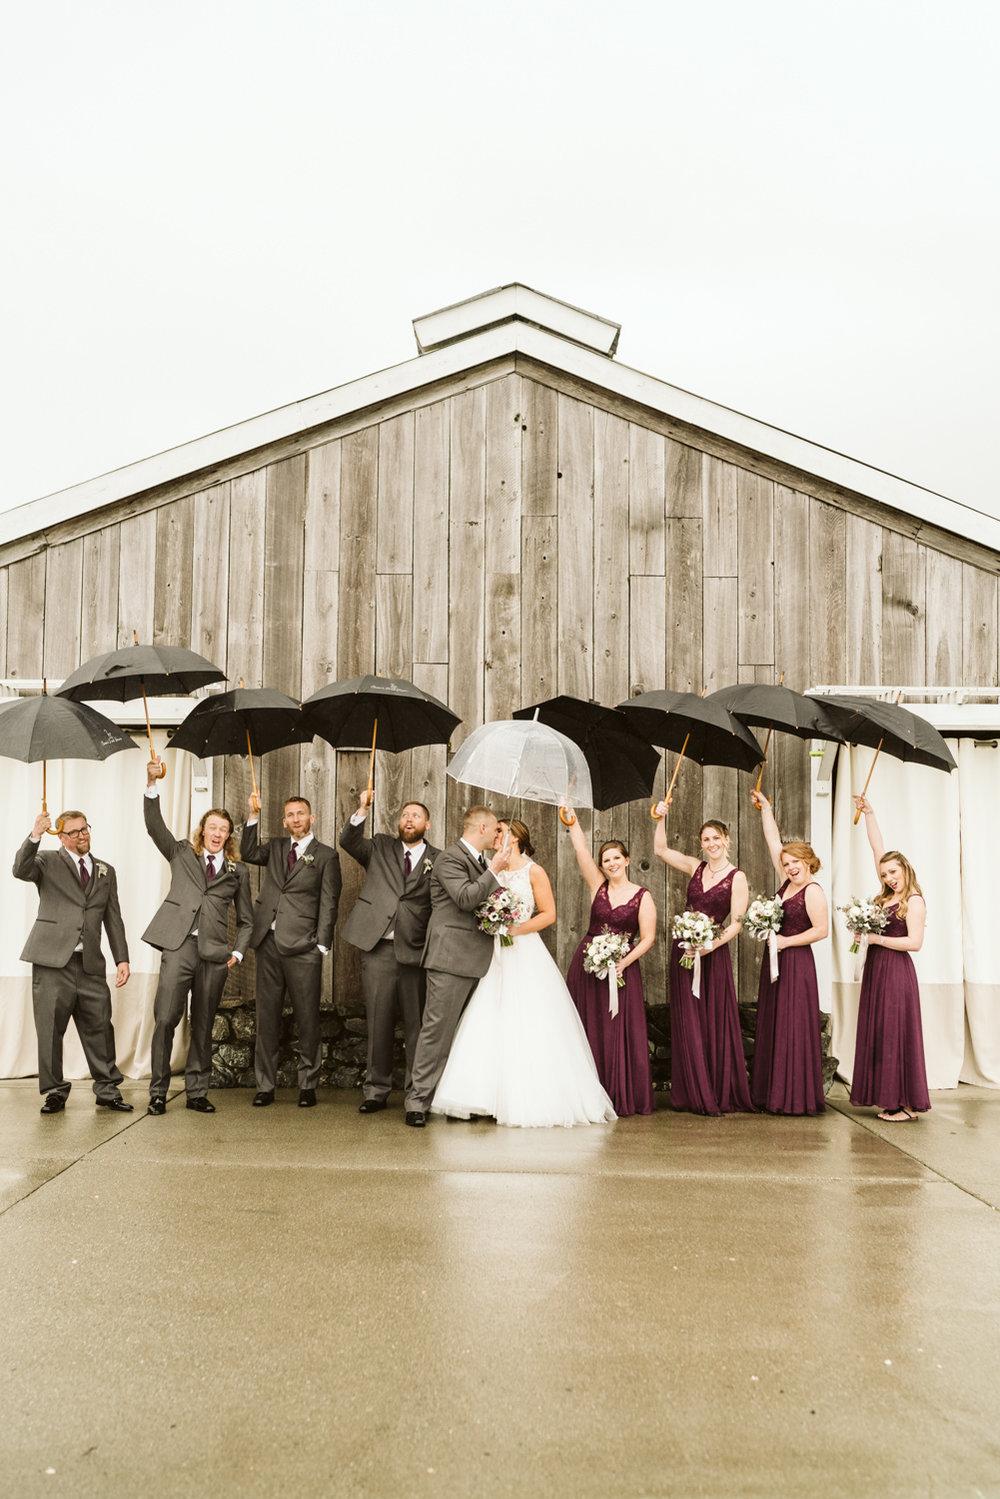 April Yentas Photography - jen and anthony wedding-57.jpg